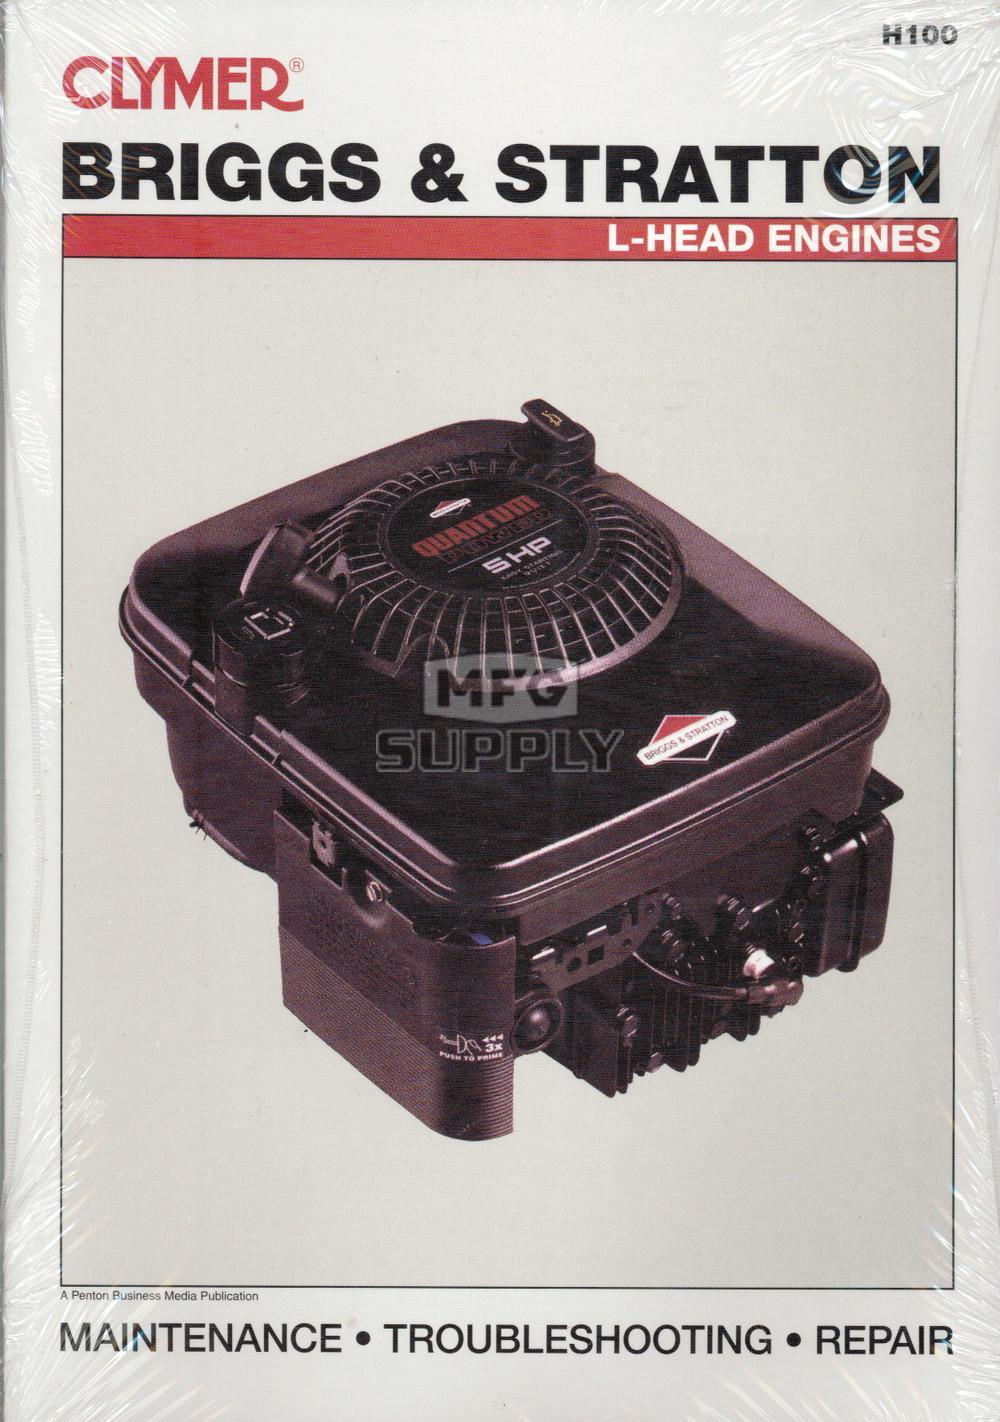 briggs stratton l head engines repair manual small engine parts rh mfgsupply com briggs & stratton engine parts manual briggs & stratton small engine repair manual